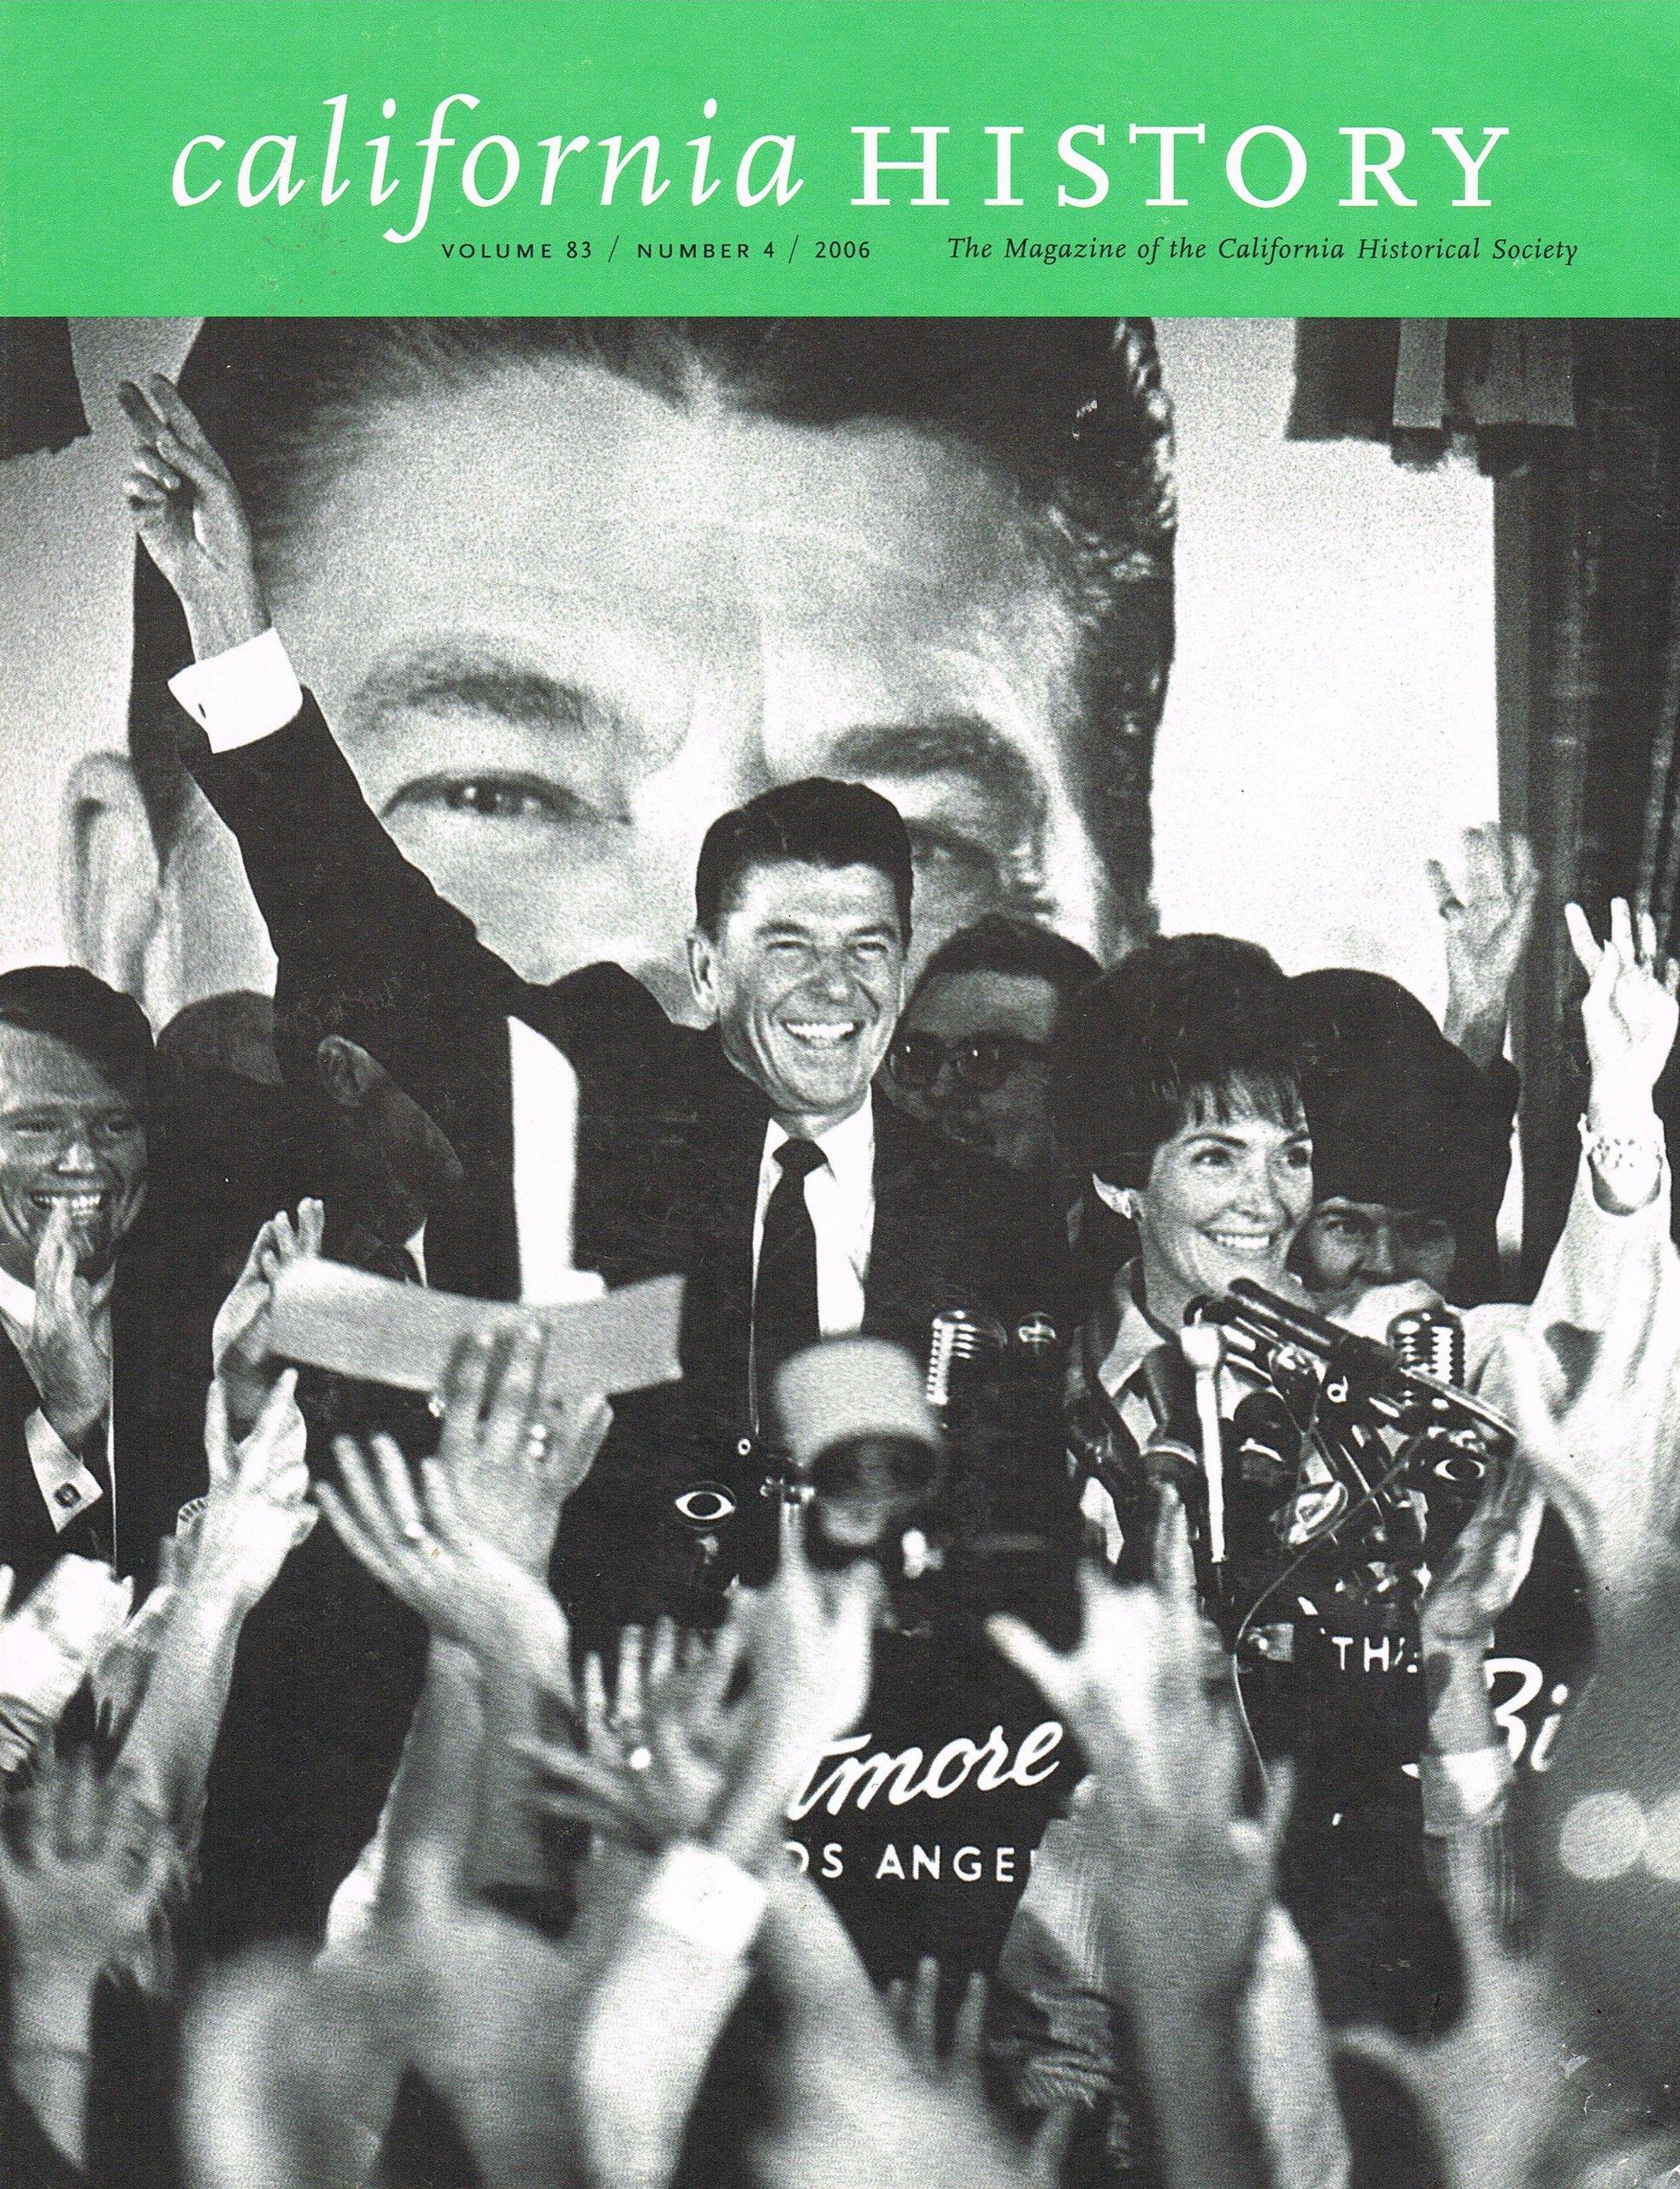 Download California History: The Magazine of the California Historical Society (Volume 83/ No. 4) 2006 (Ronald Reagan cover) ebook